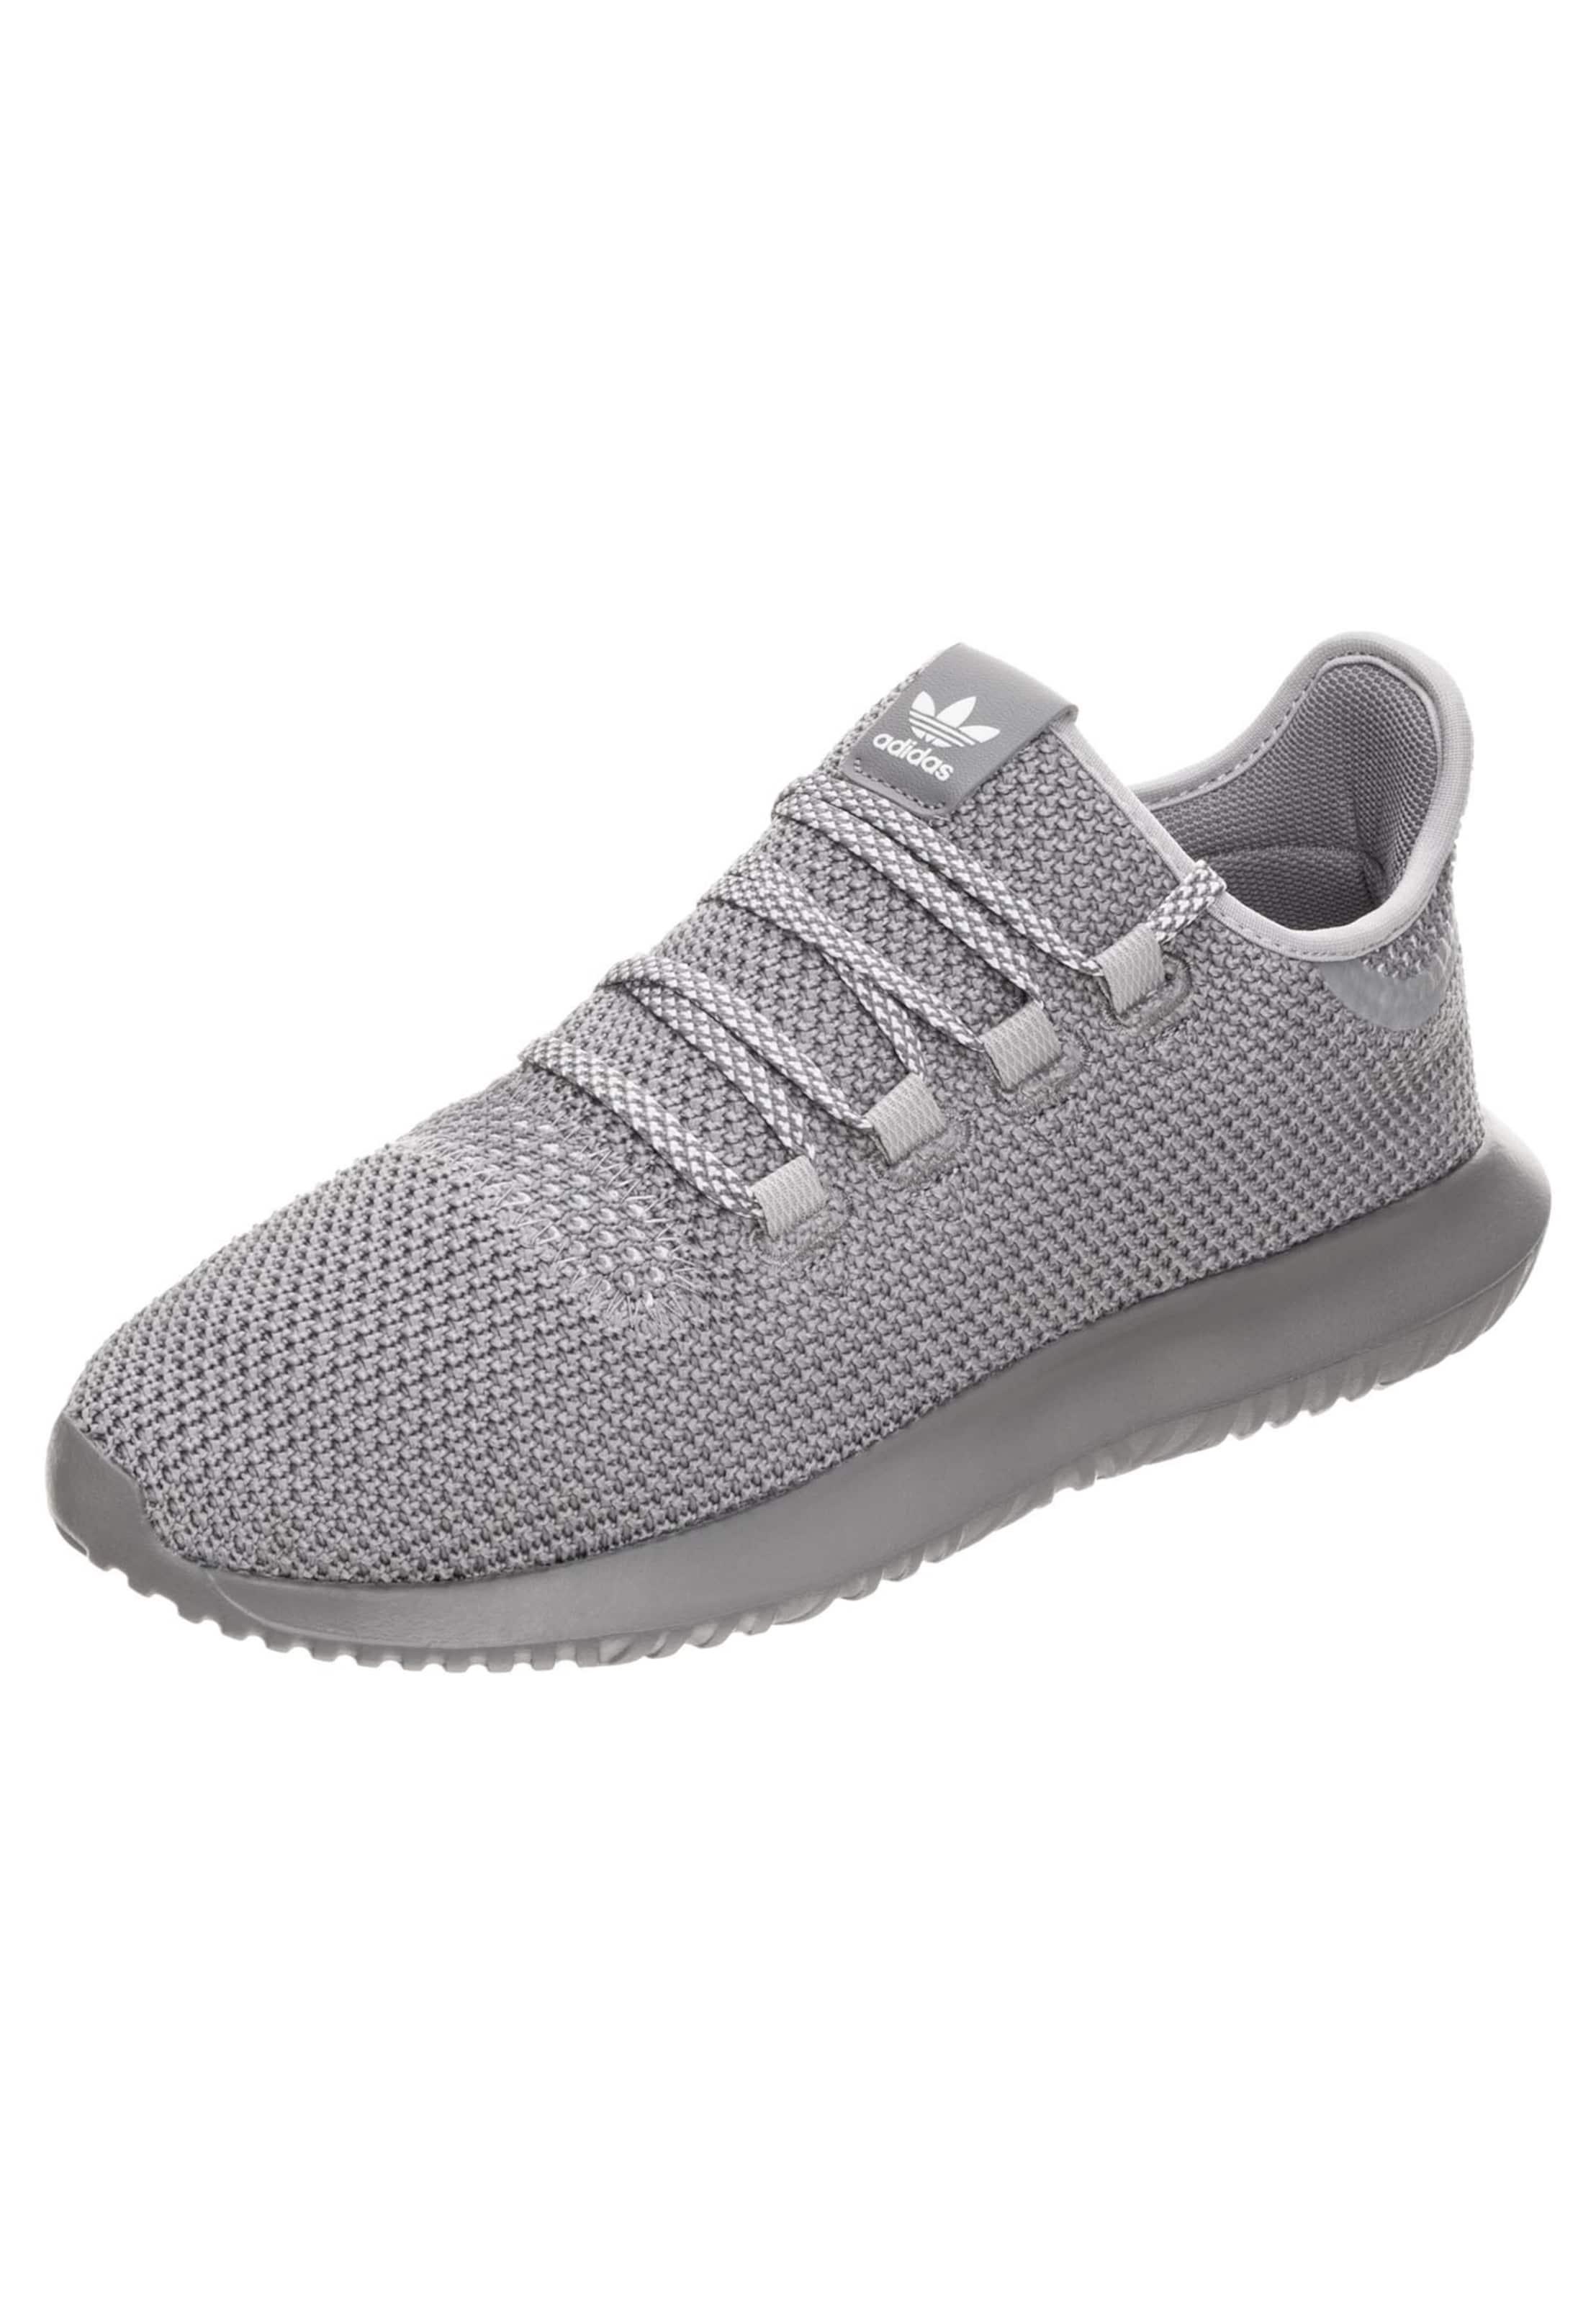 ADIDAS ORIGINALS Sneaker  Tubular Shadow CK